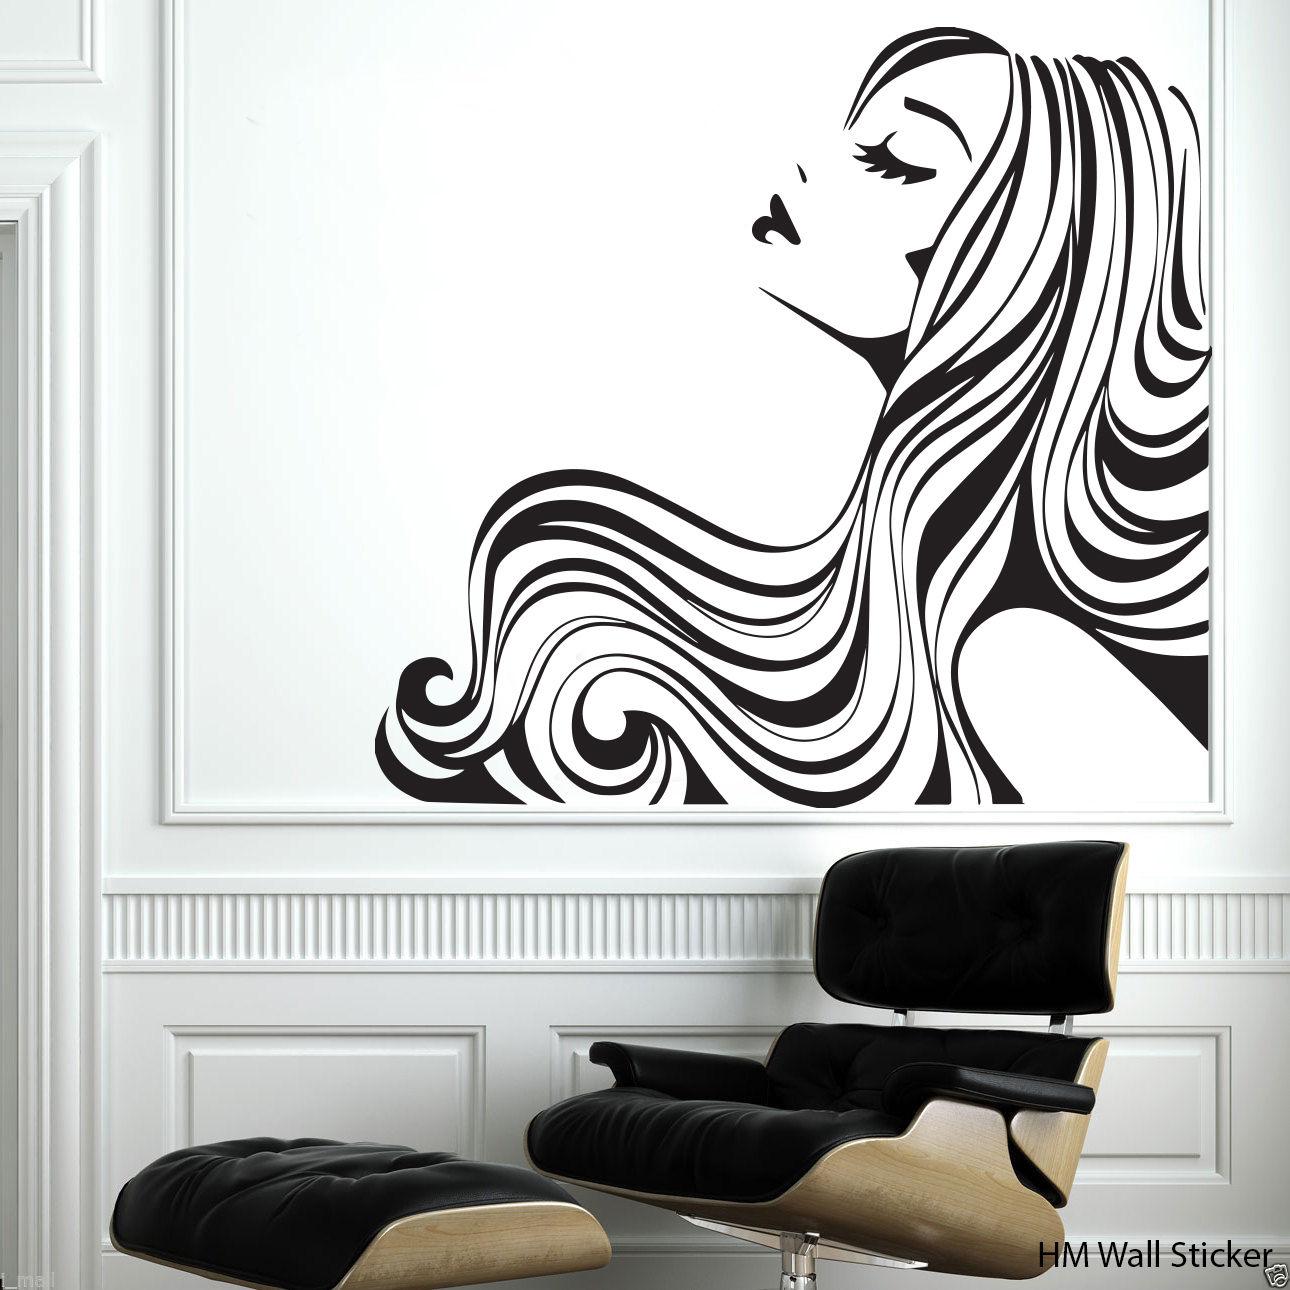 G145 cabellera pegatinas de pared desmontable etiqueta for Pegatinas vinilo decoracion